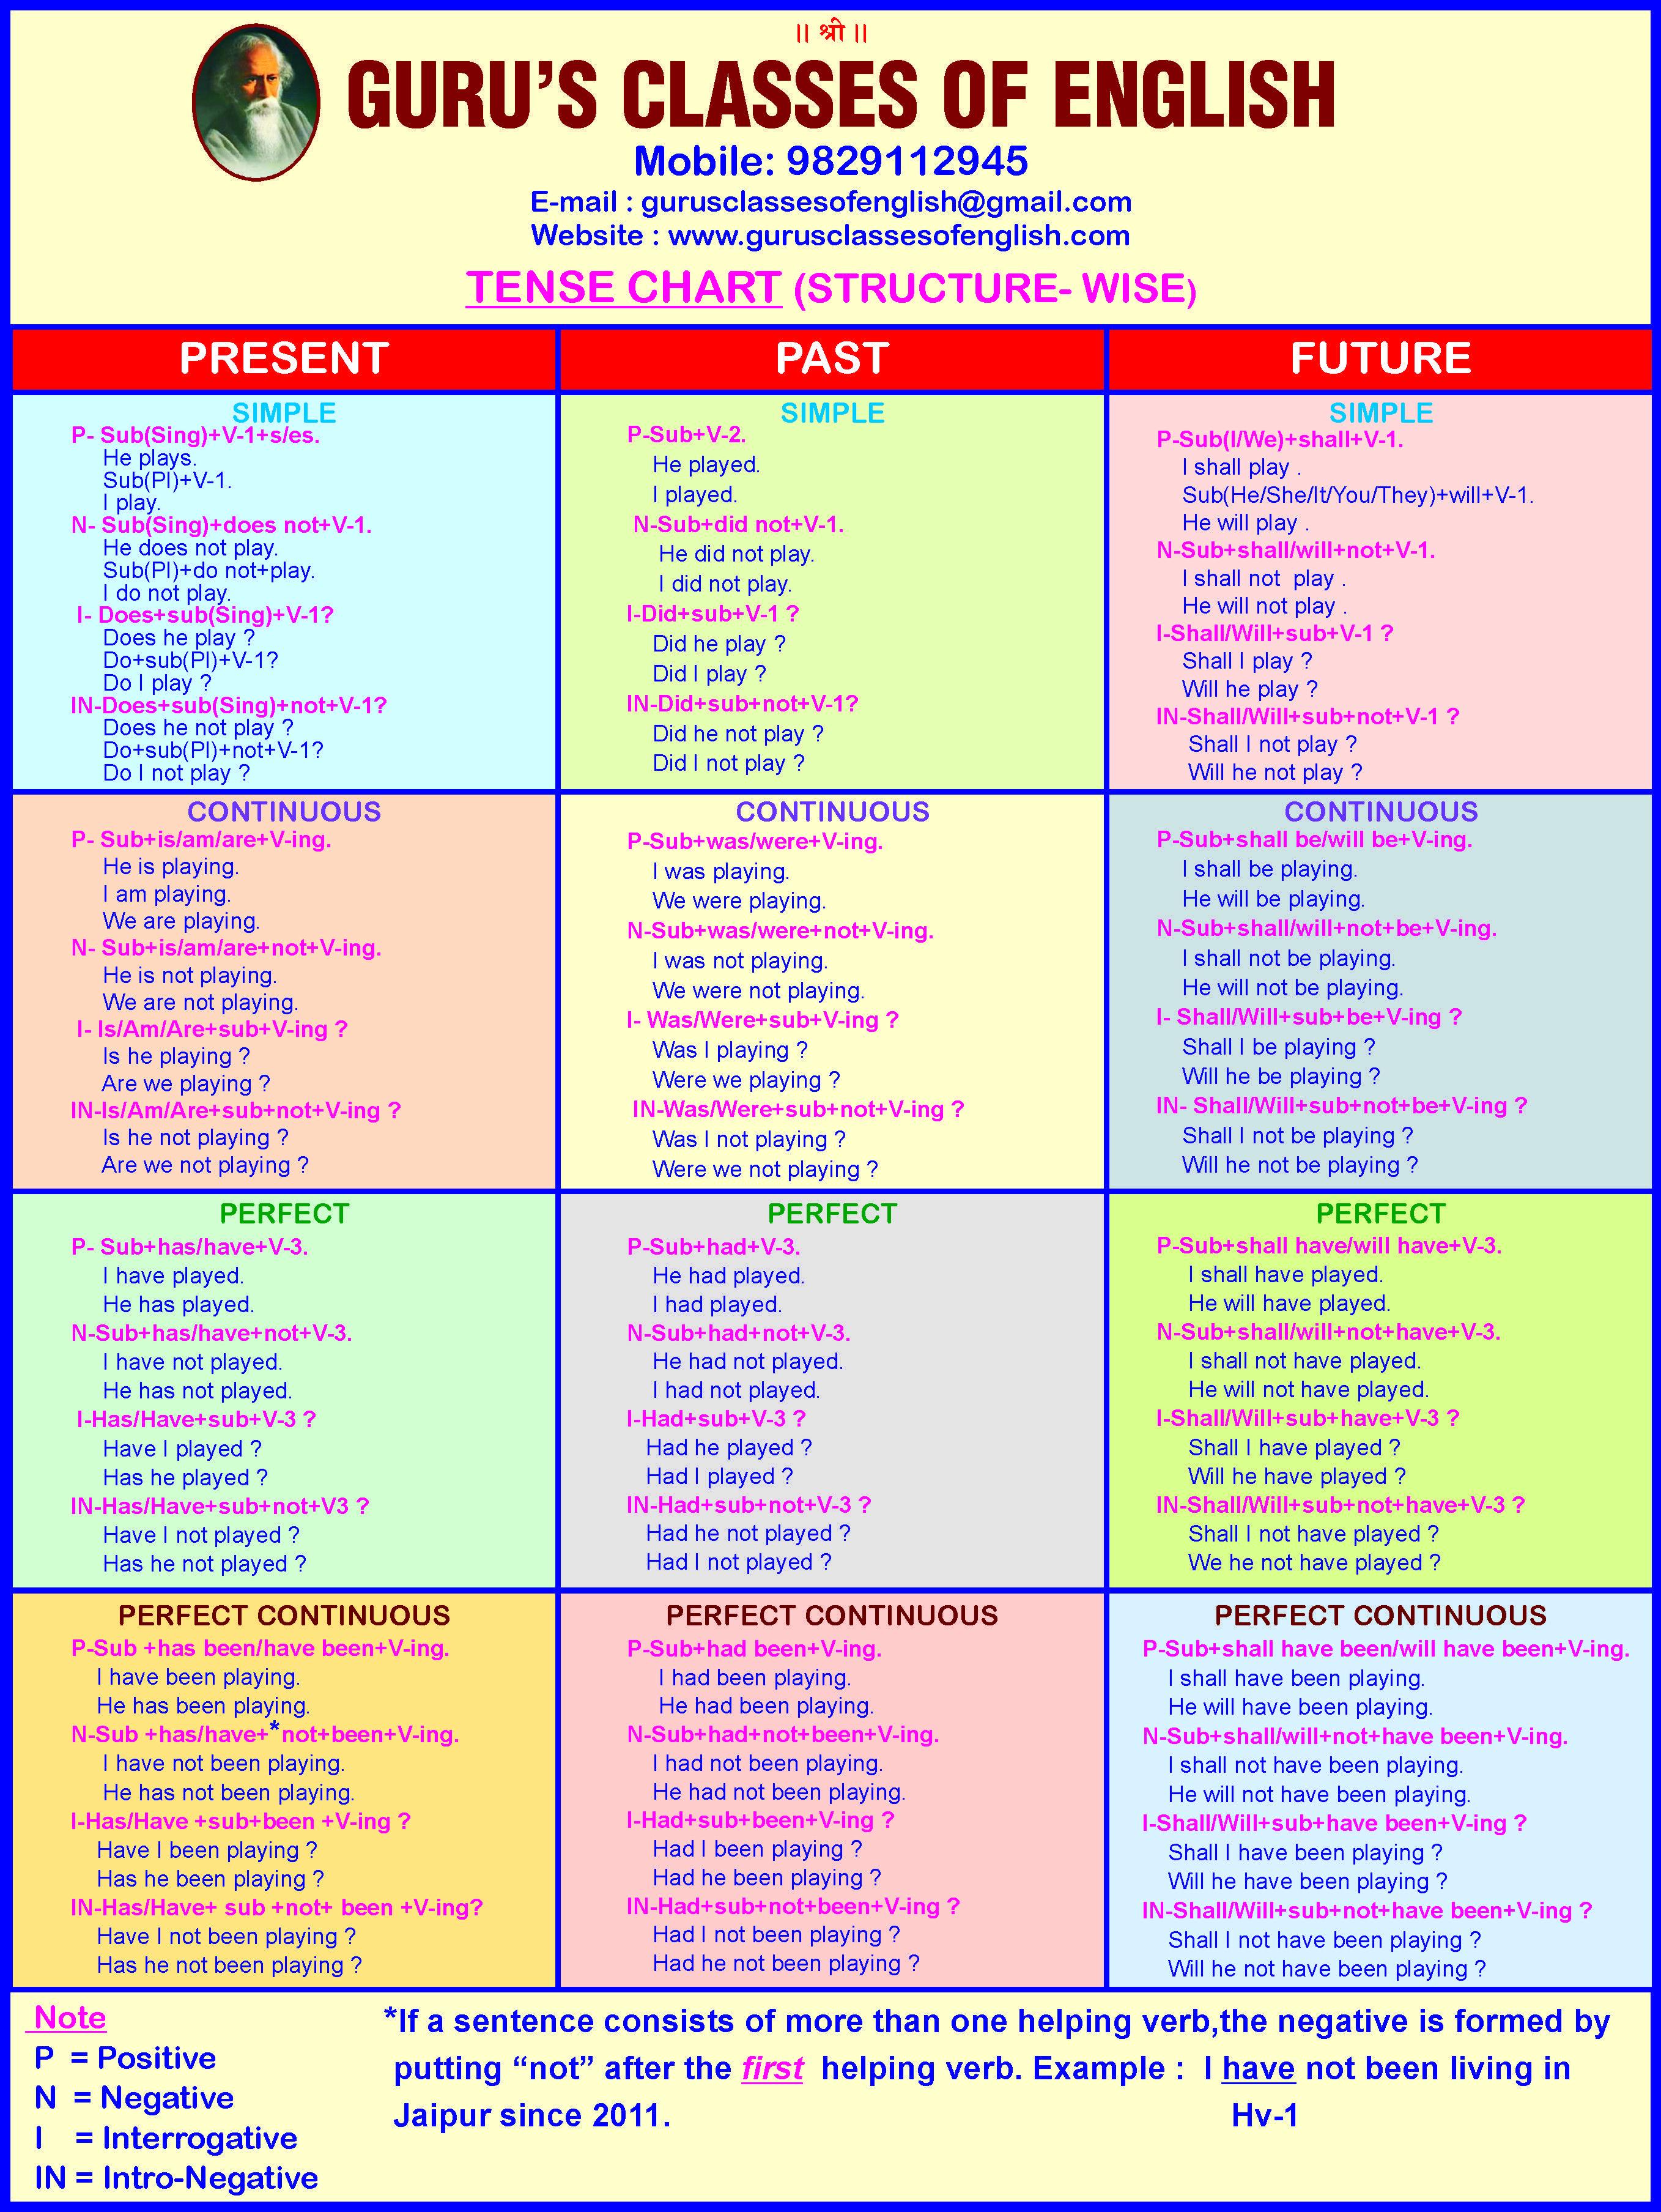 44 Sounds Phonics Class Resources